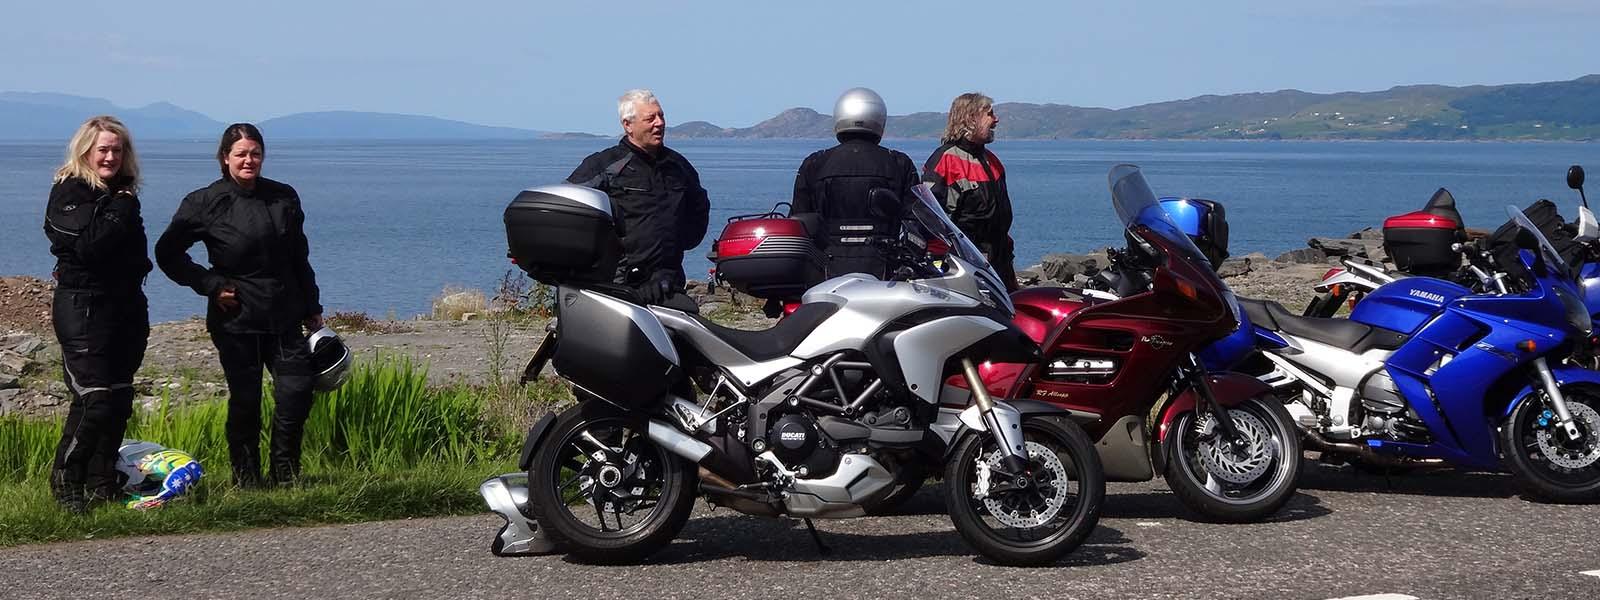 Scotlands West Coast Motorcycle Tour – Argyll & Bute / Kintyre